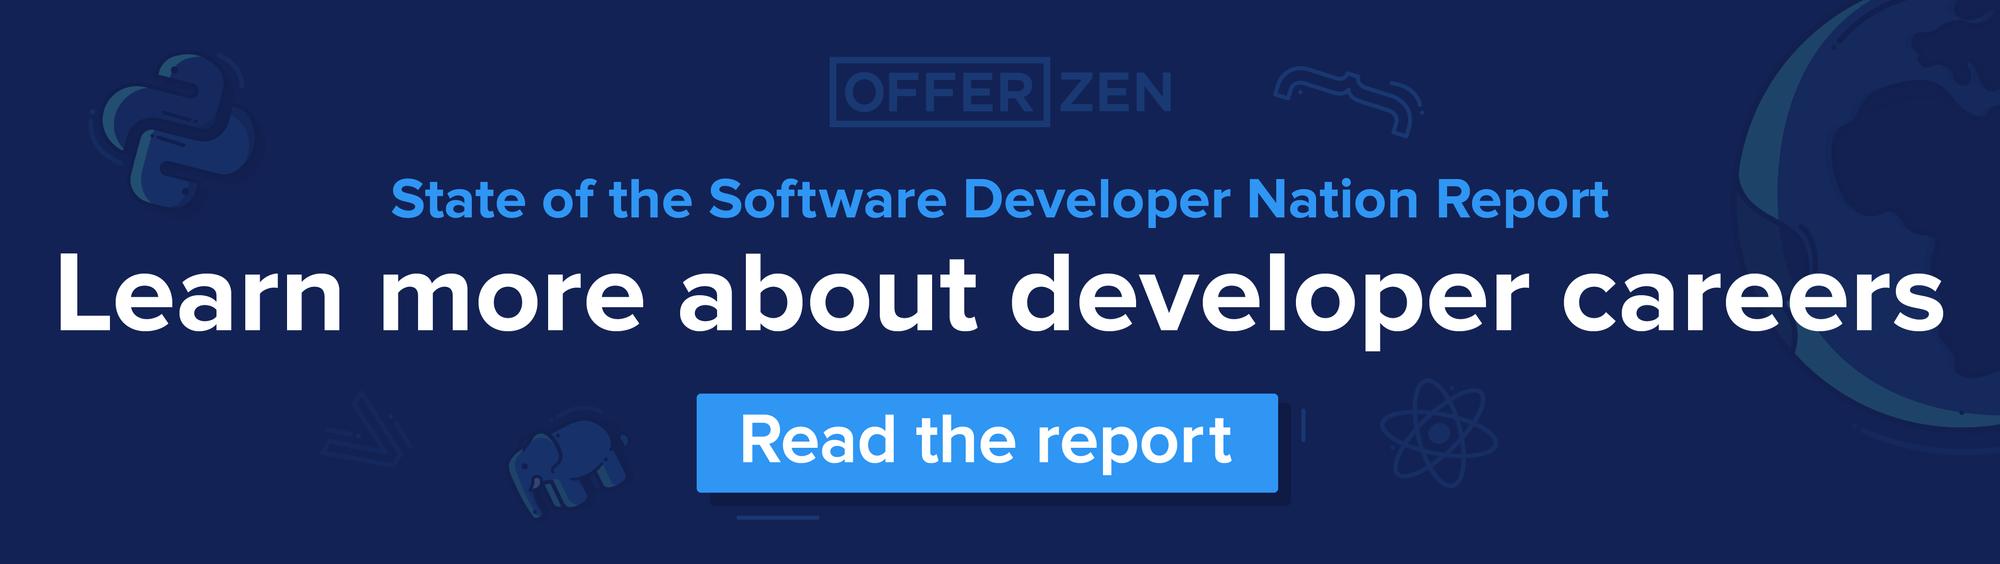 OfferZen_2021_State-of-the-Software-Developer-Nation-Report_Inner-article-CTA_Developer-careers-76-2